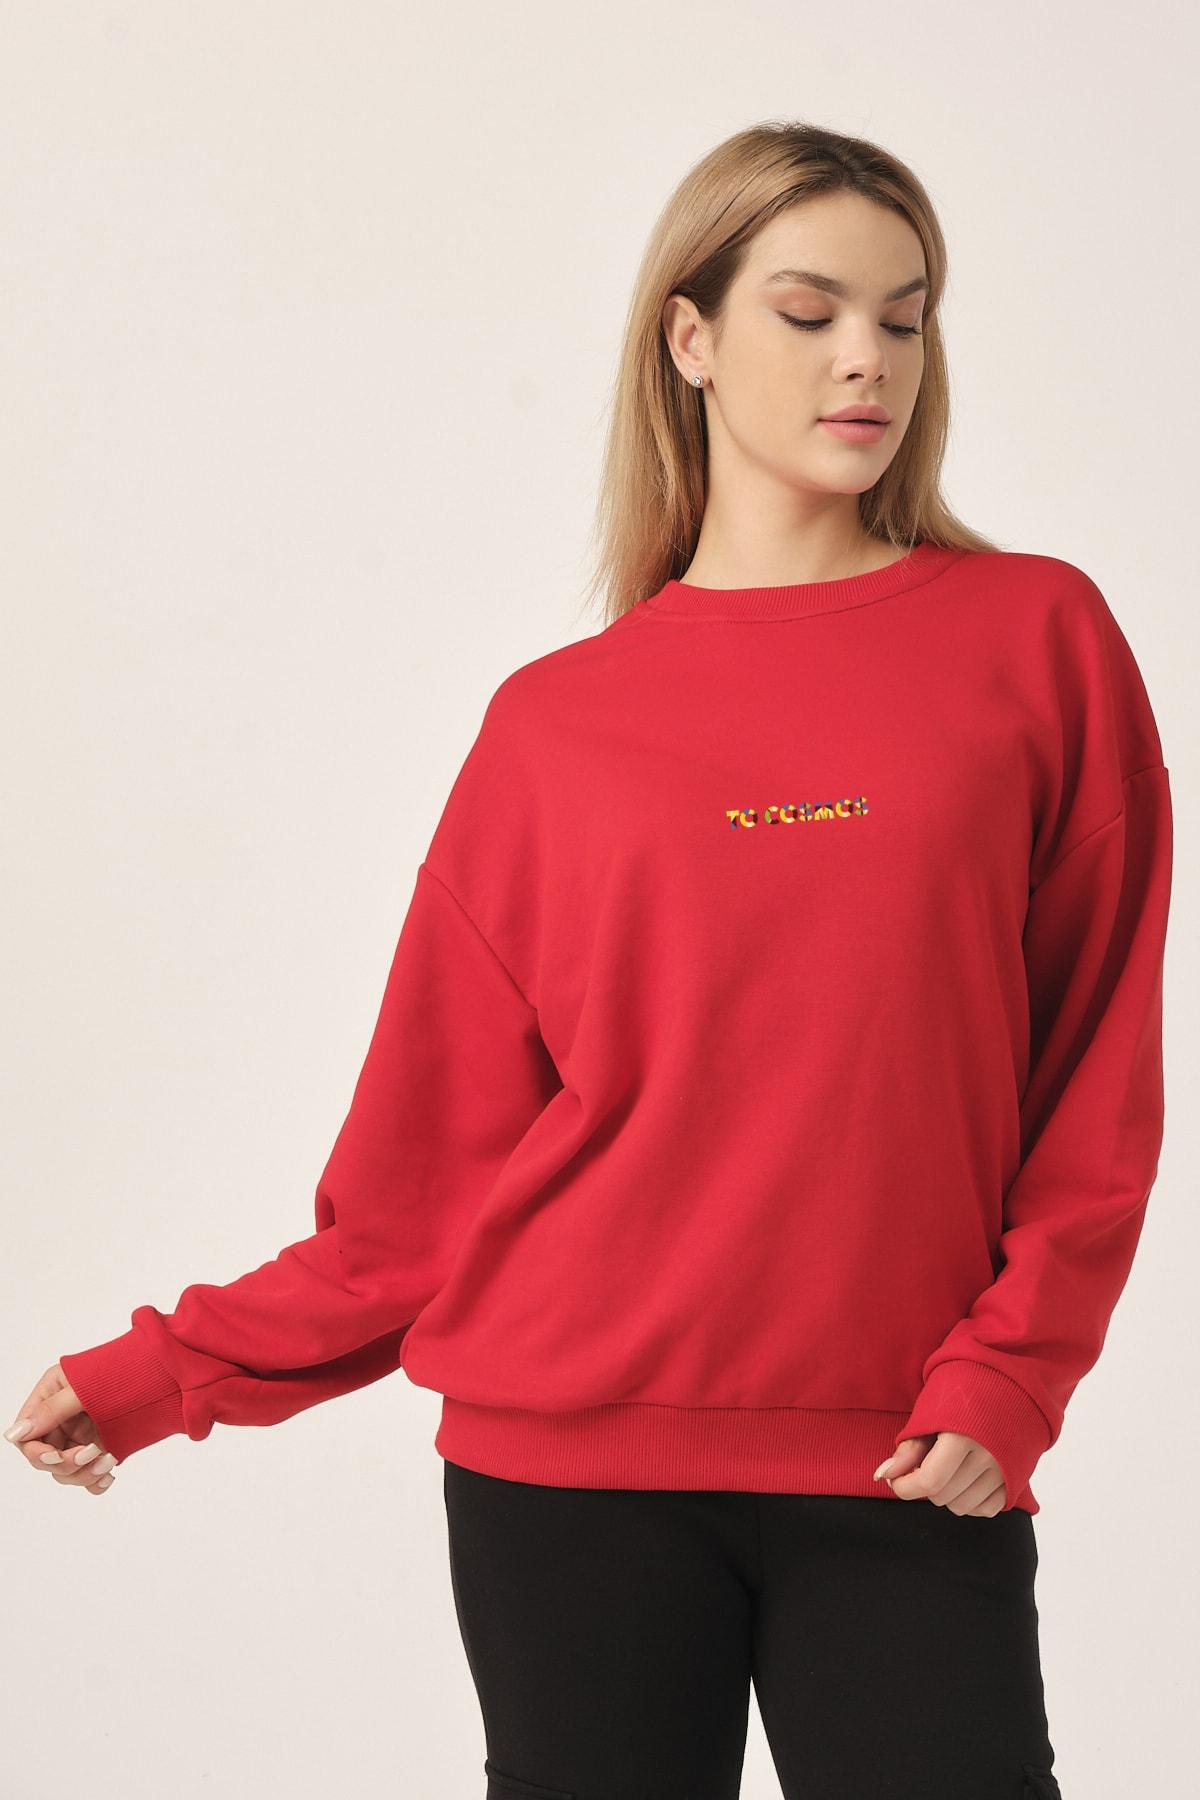 to COSMOS Oversıze Sweatshırt Unısex Renk Kırmızı Cosmos 2